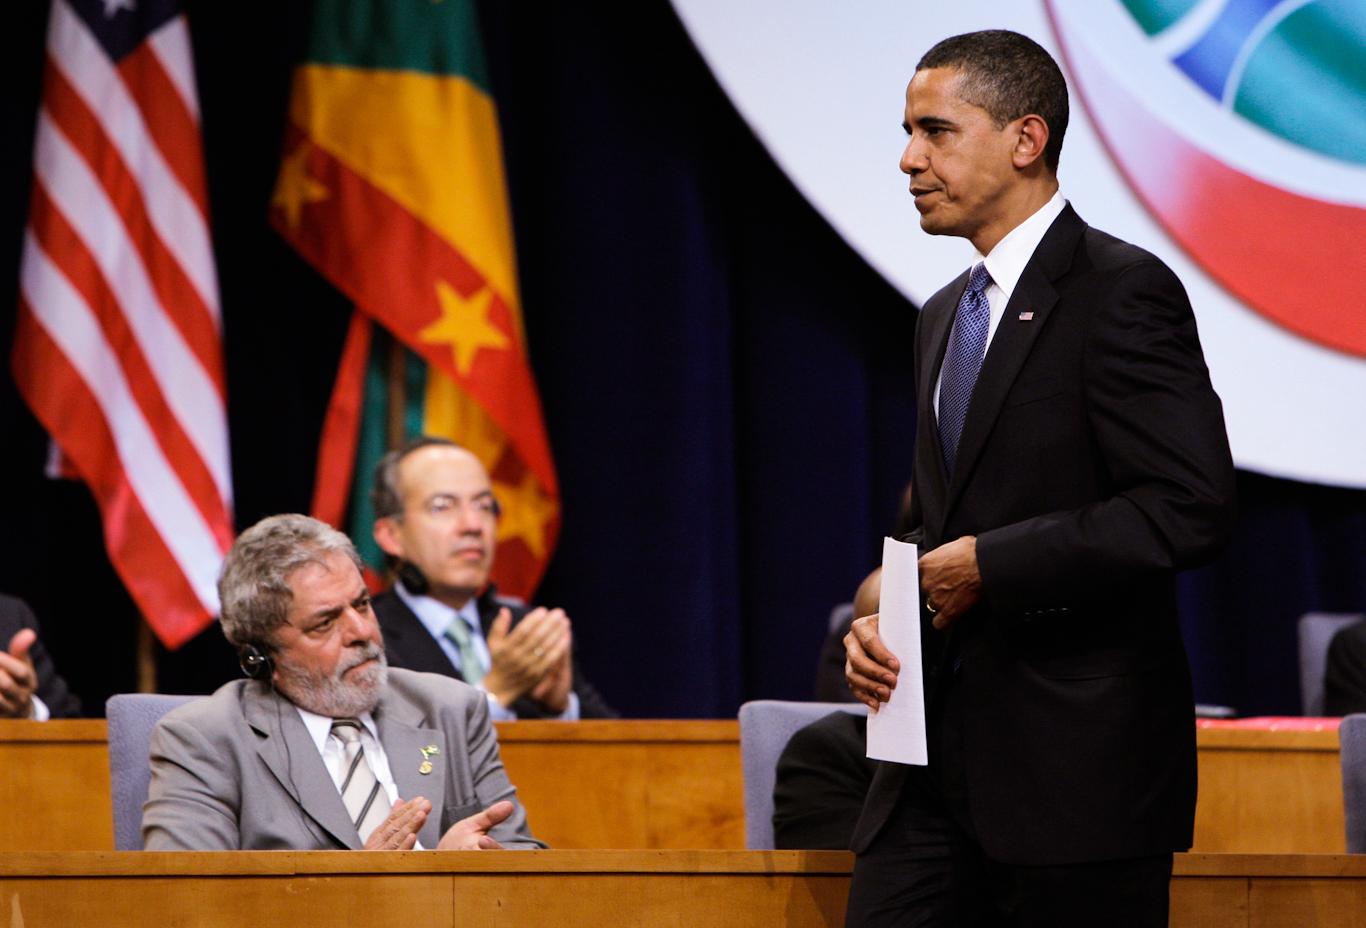 Luiz Inacio Lula da Silva and Obama